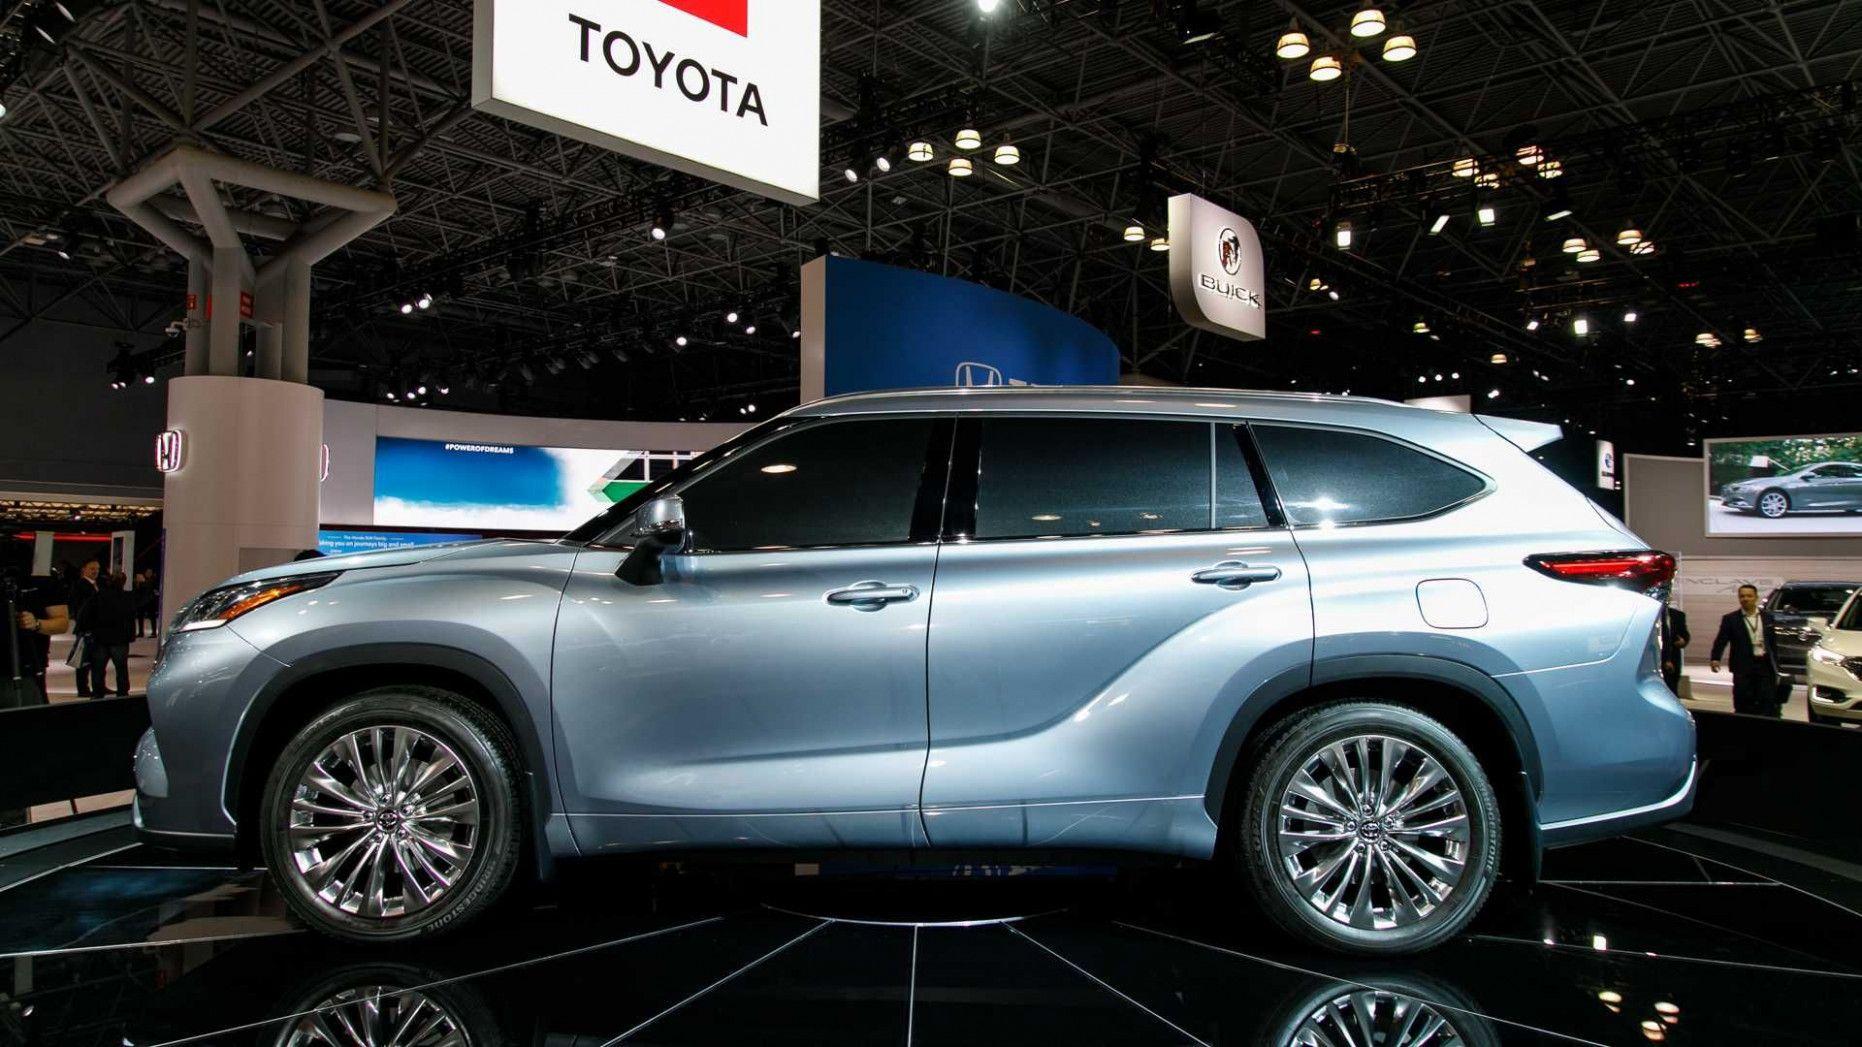 8 Picture 2020 Toyota Big Suv in 2020 Toyota highlander